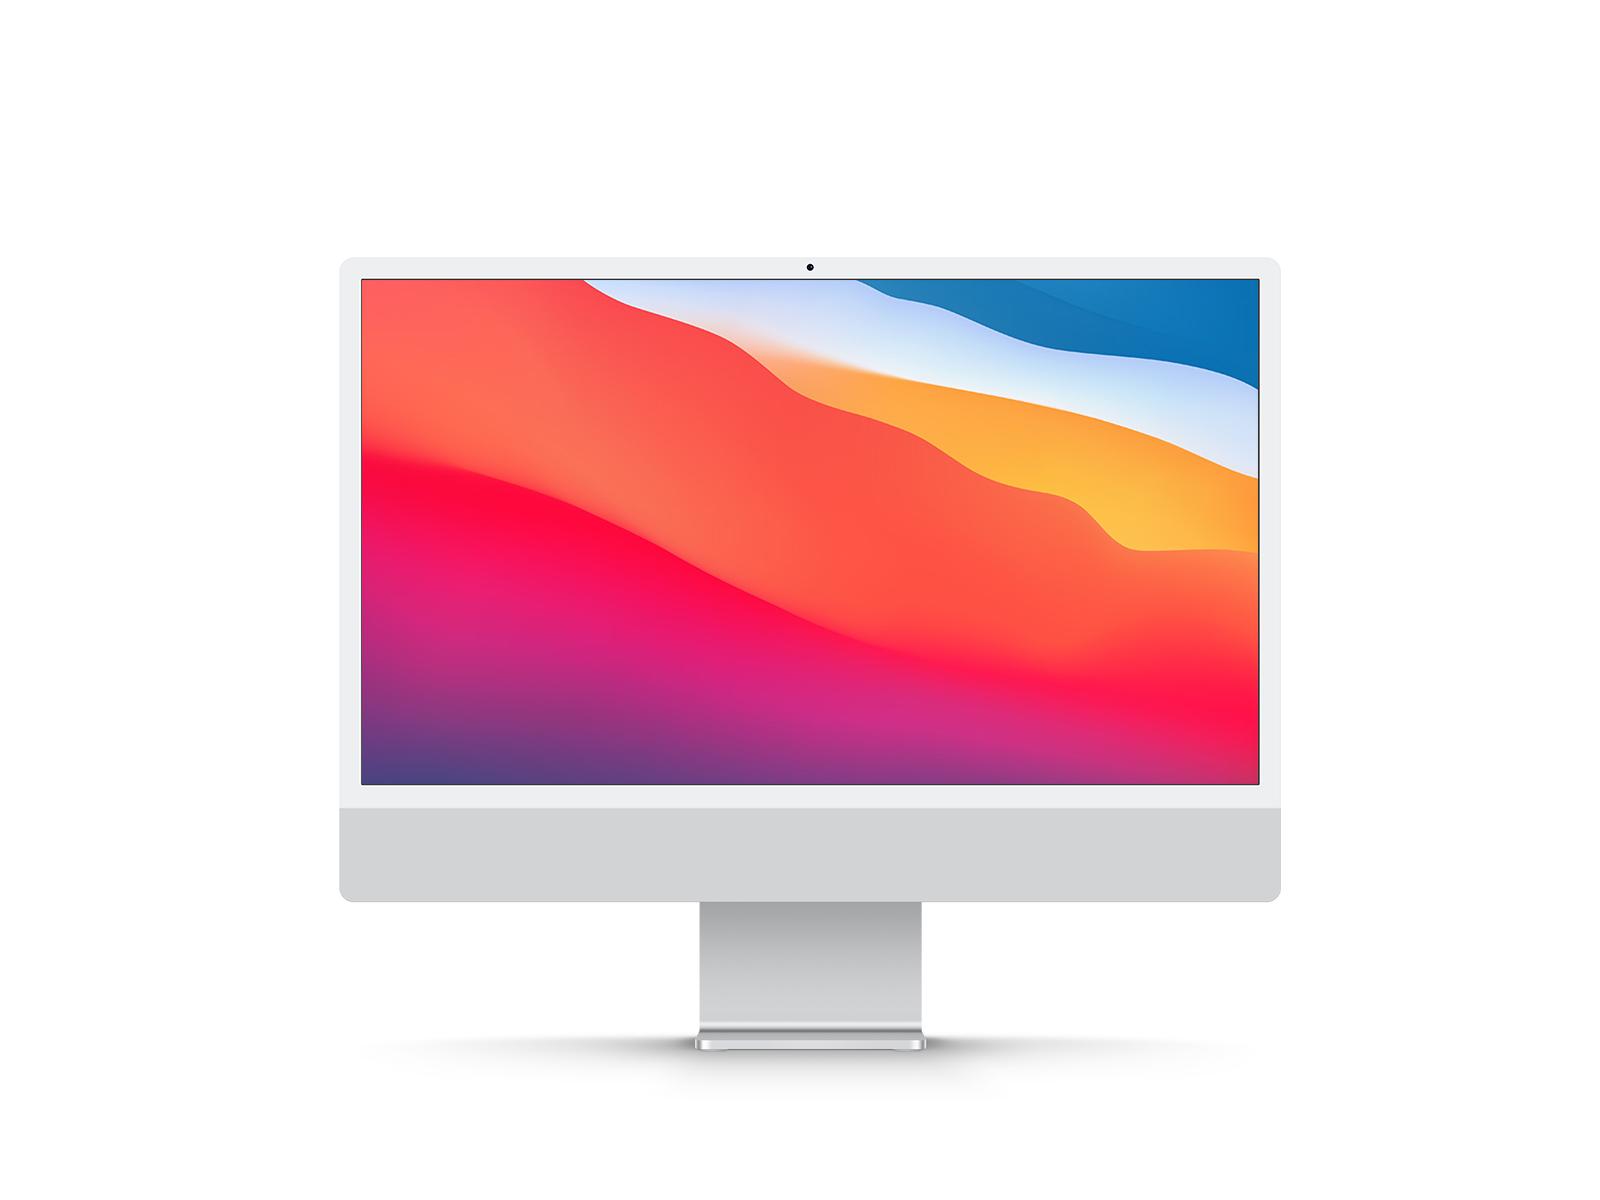 New iMac 24 Inch Display Free Mockup   Free Mockup